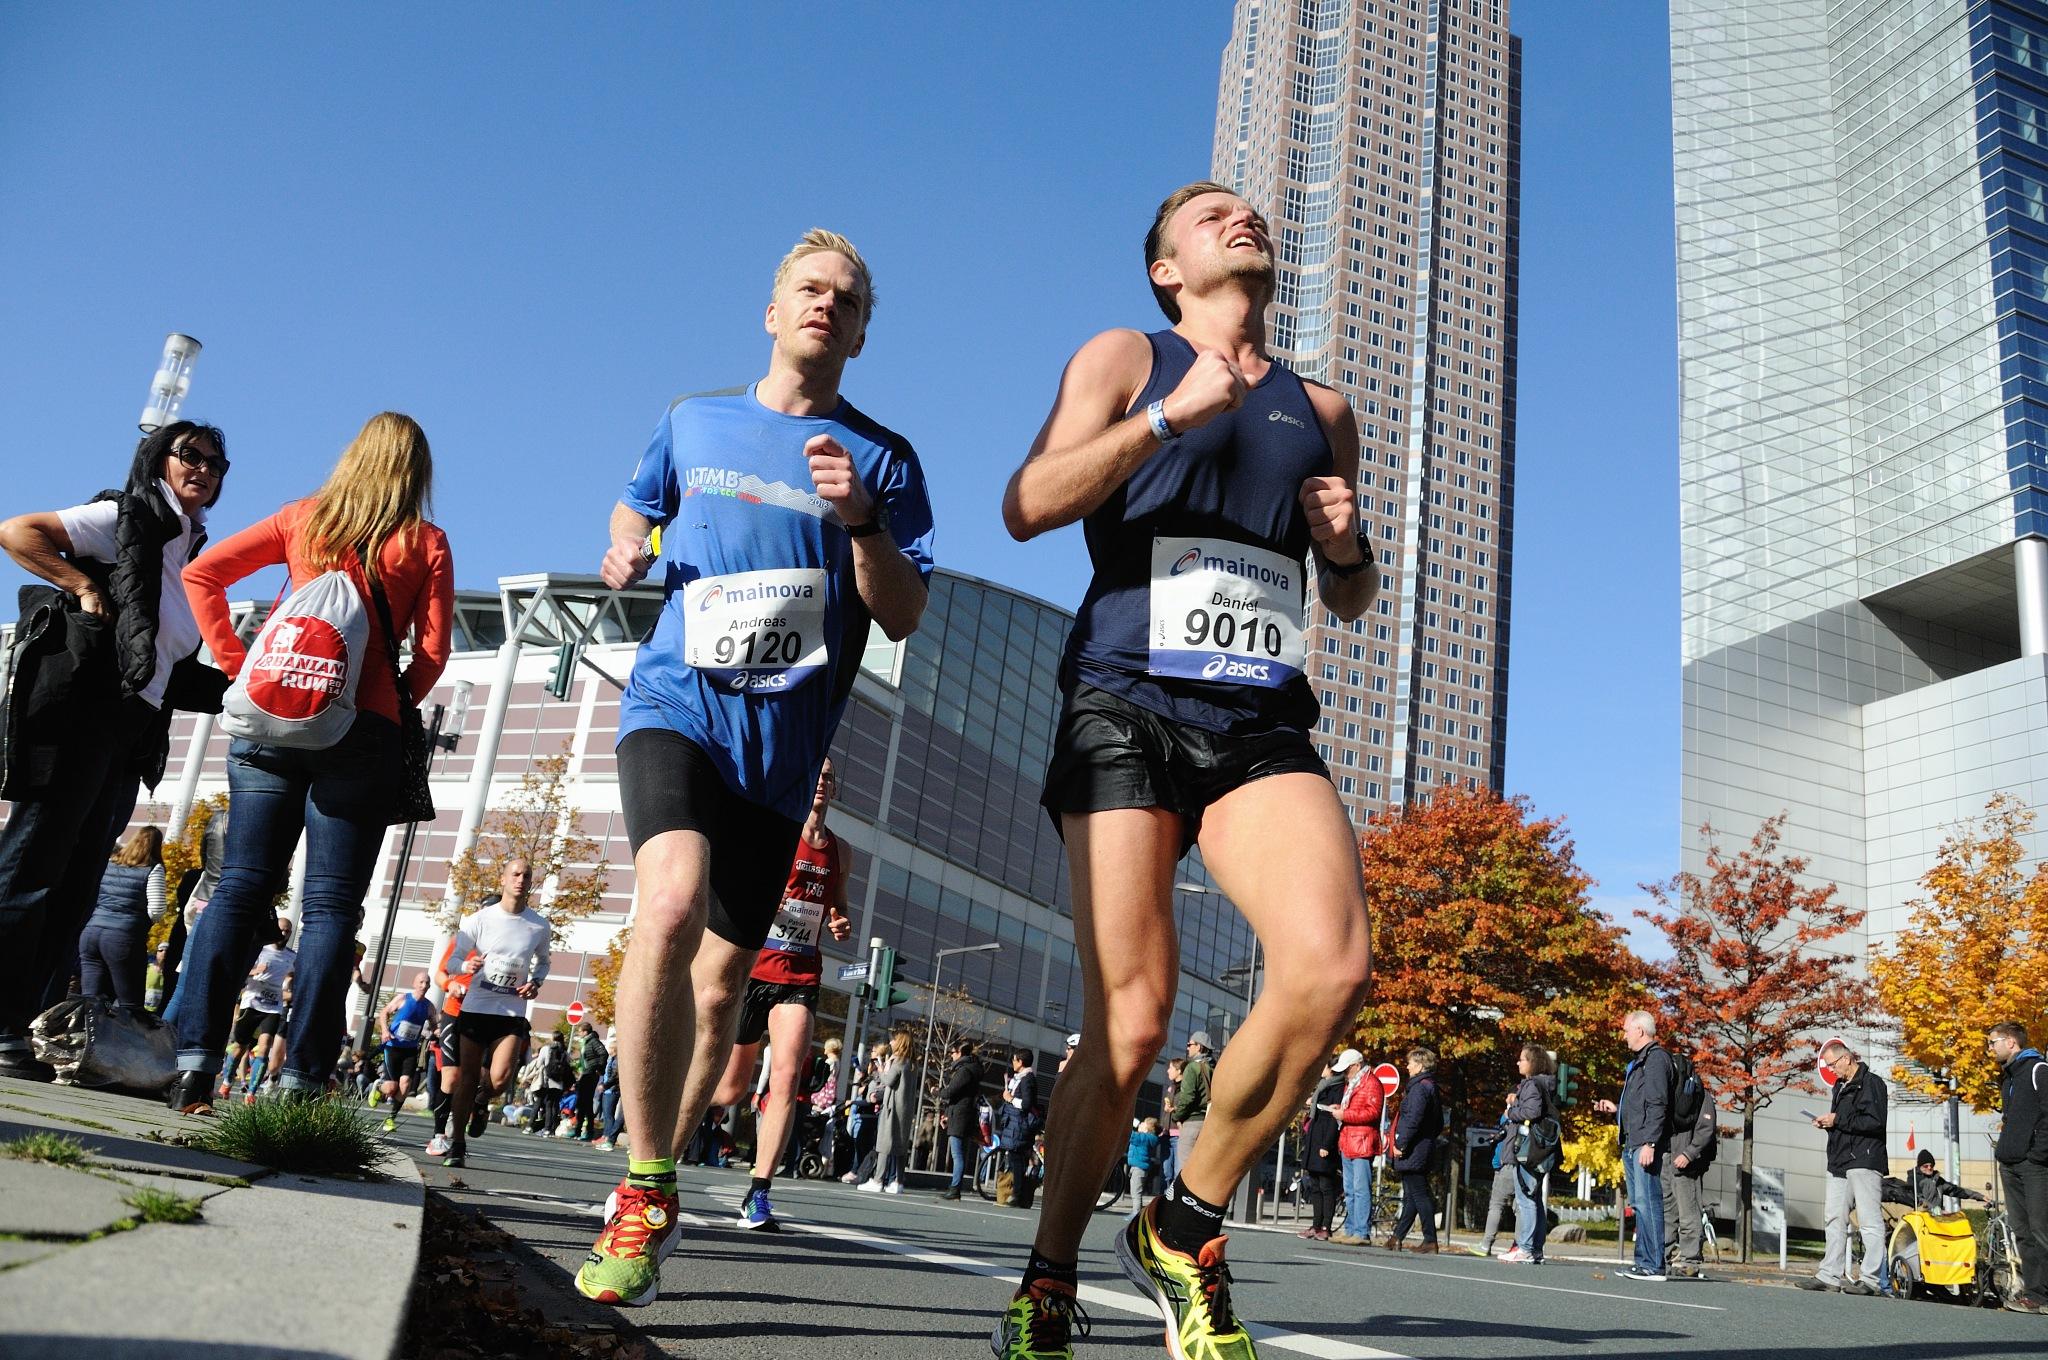 Frankfurt Marathon IV by Zdenek Krchak